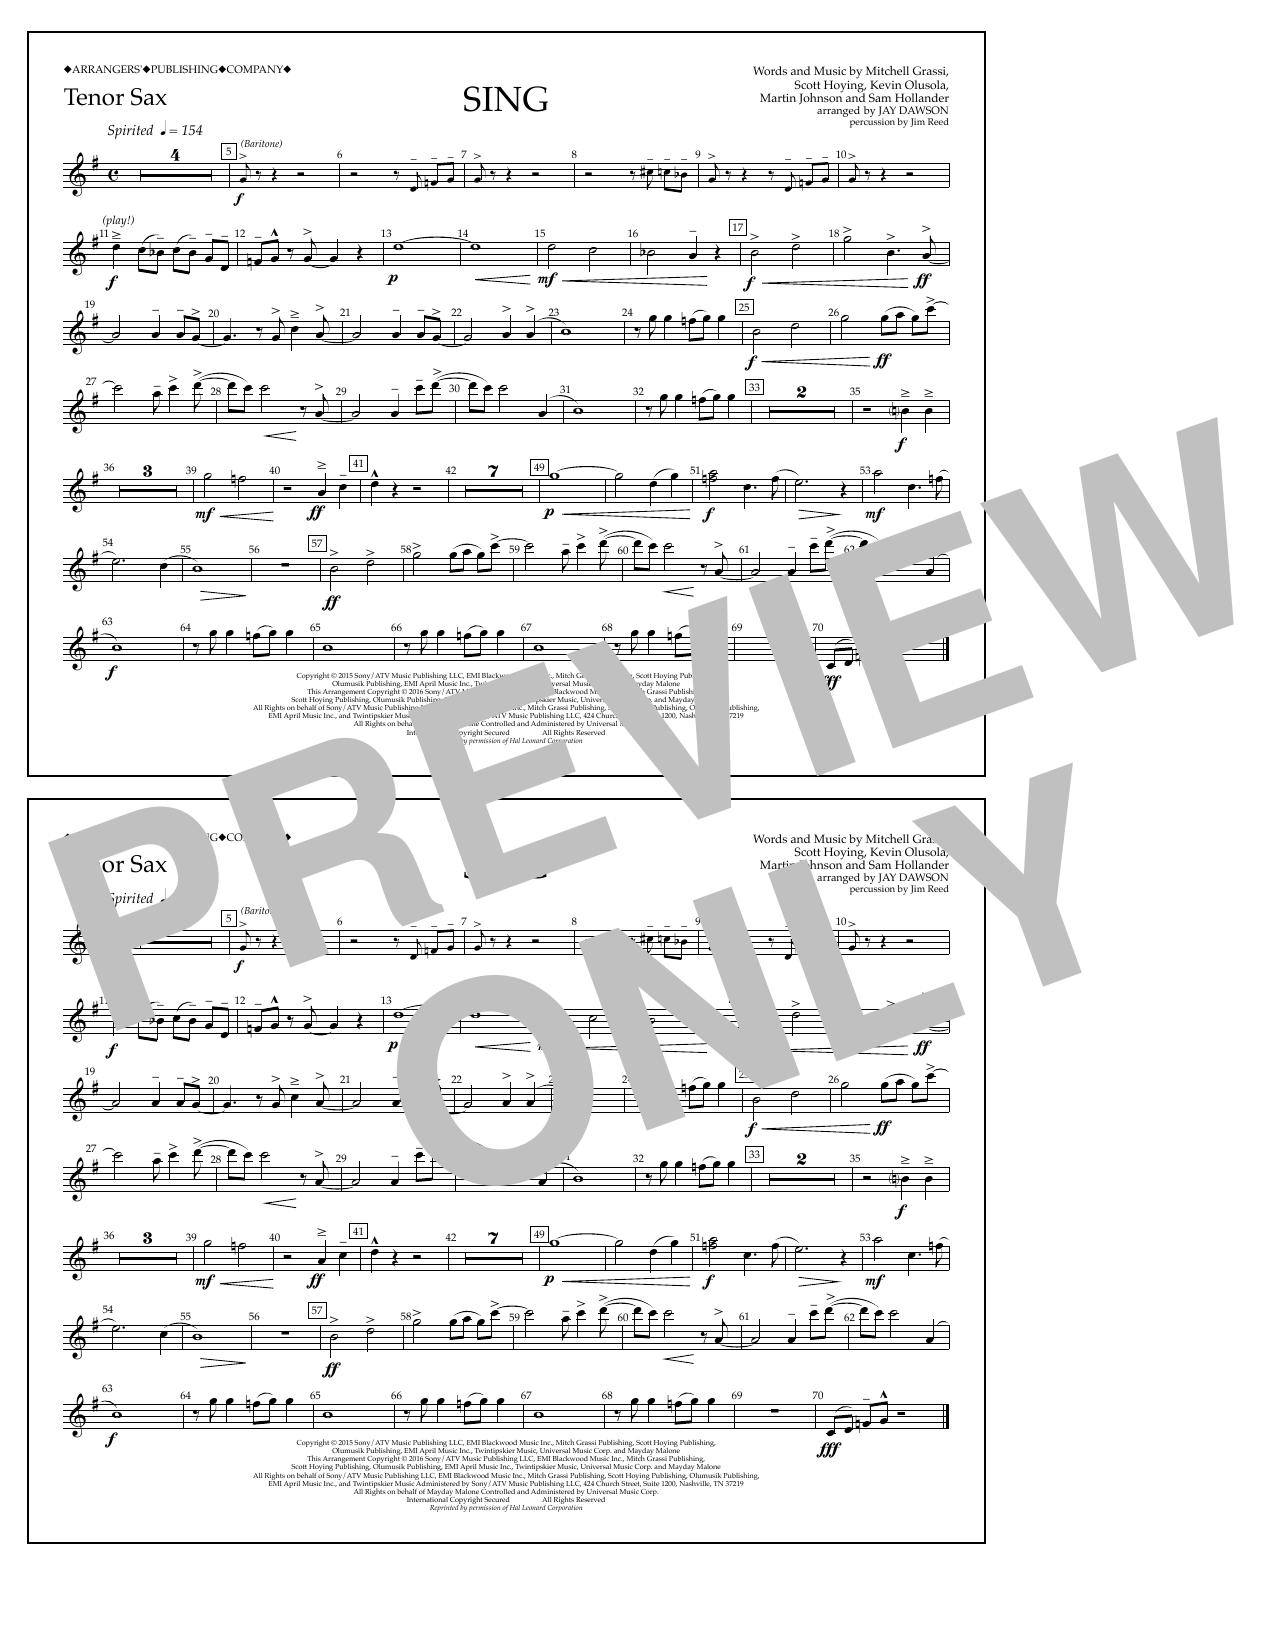 Pentatonix - Sing - Tenor Sax